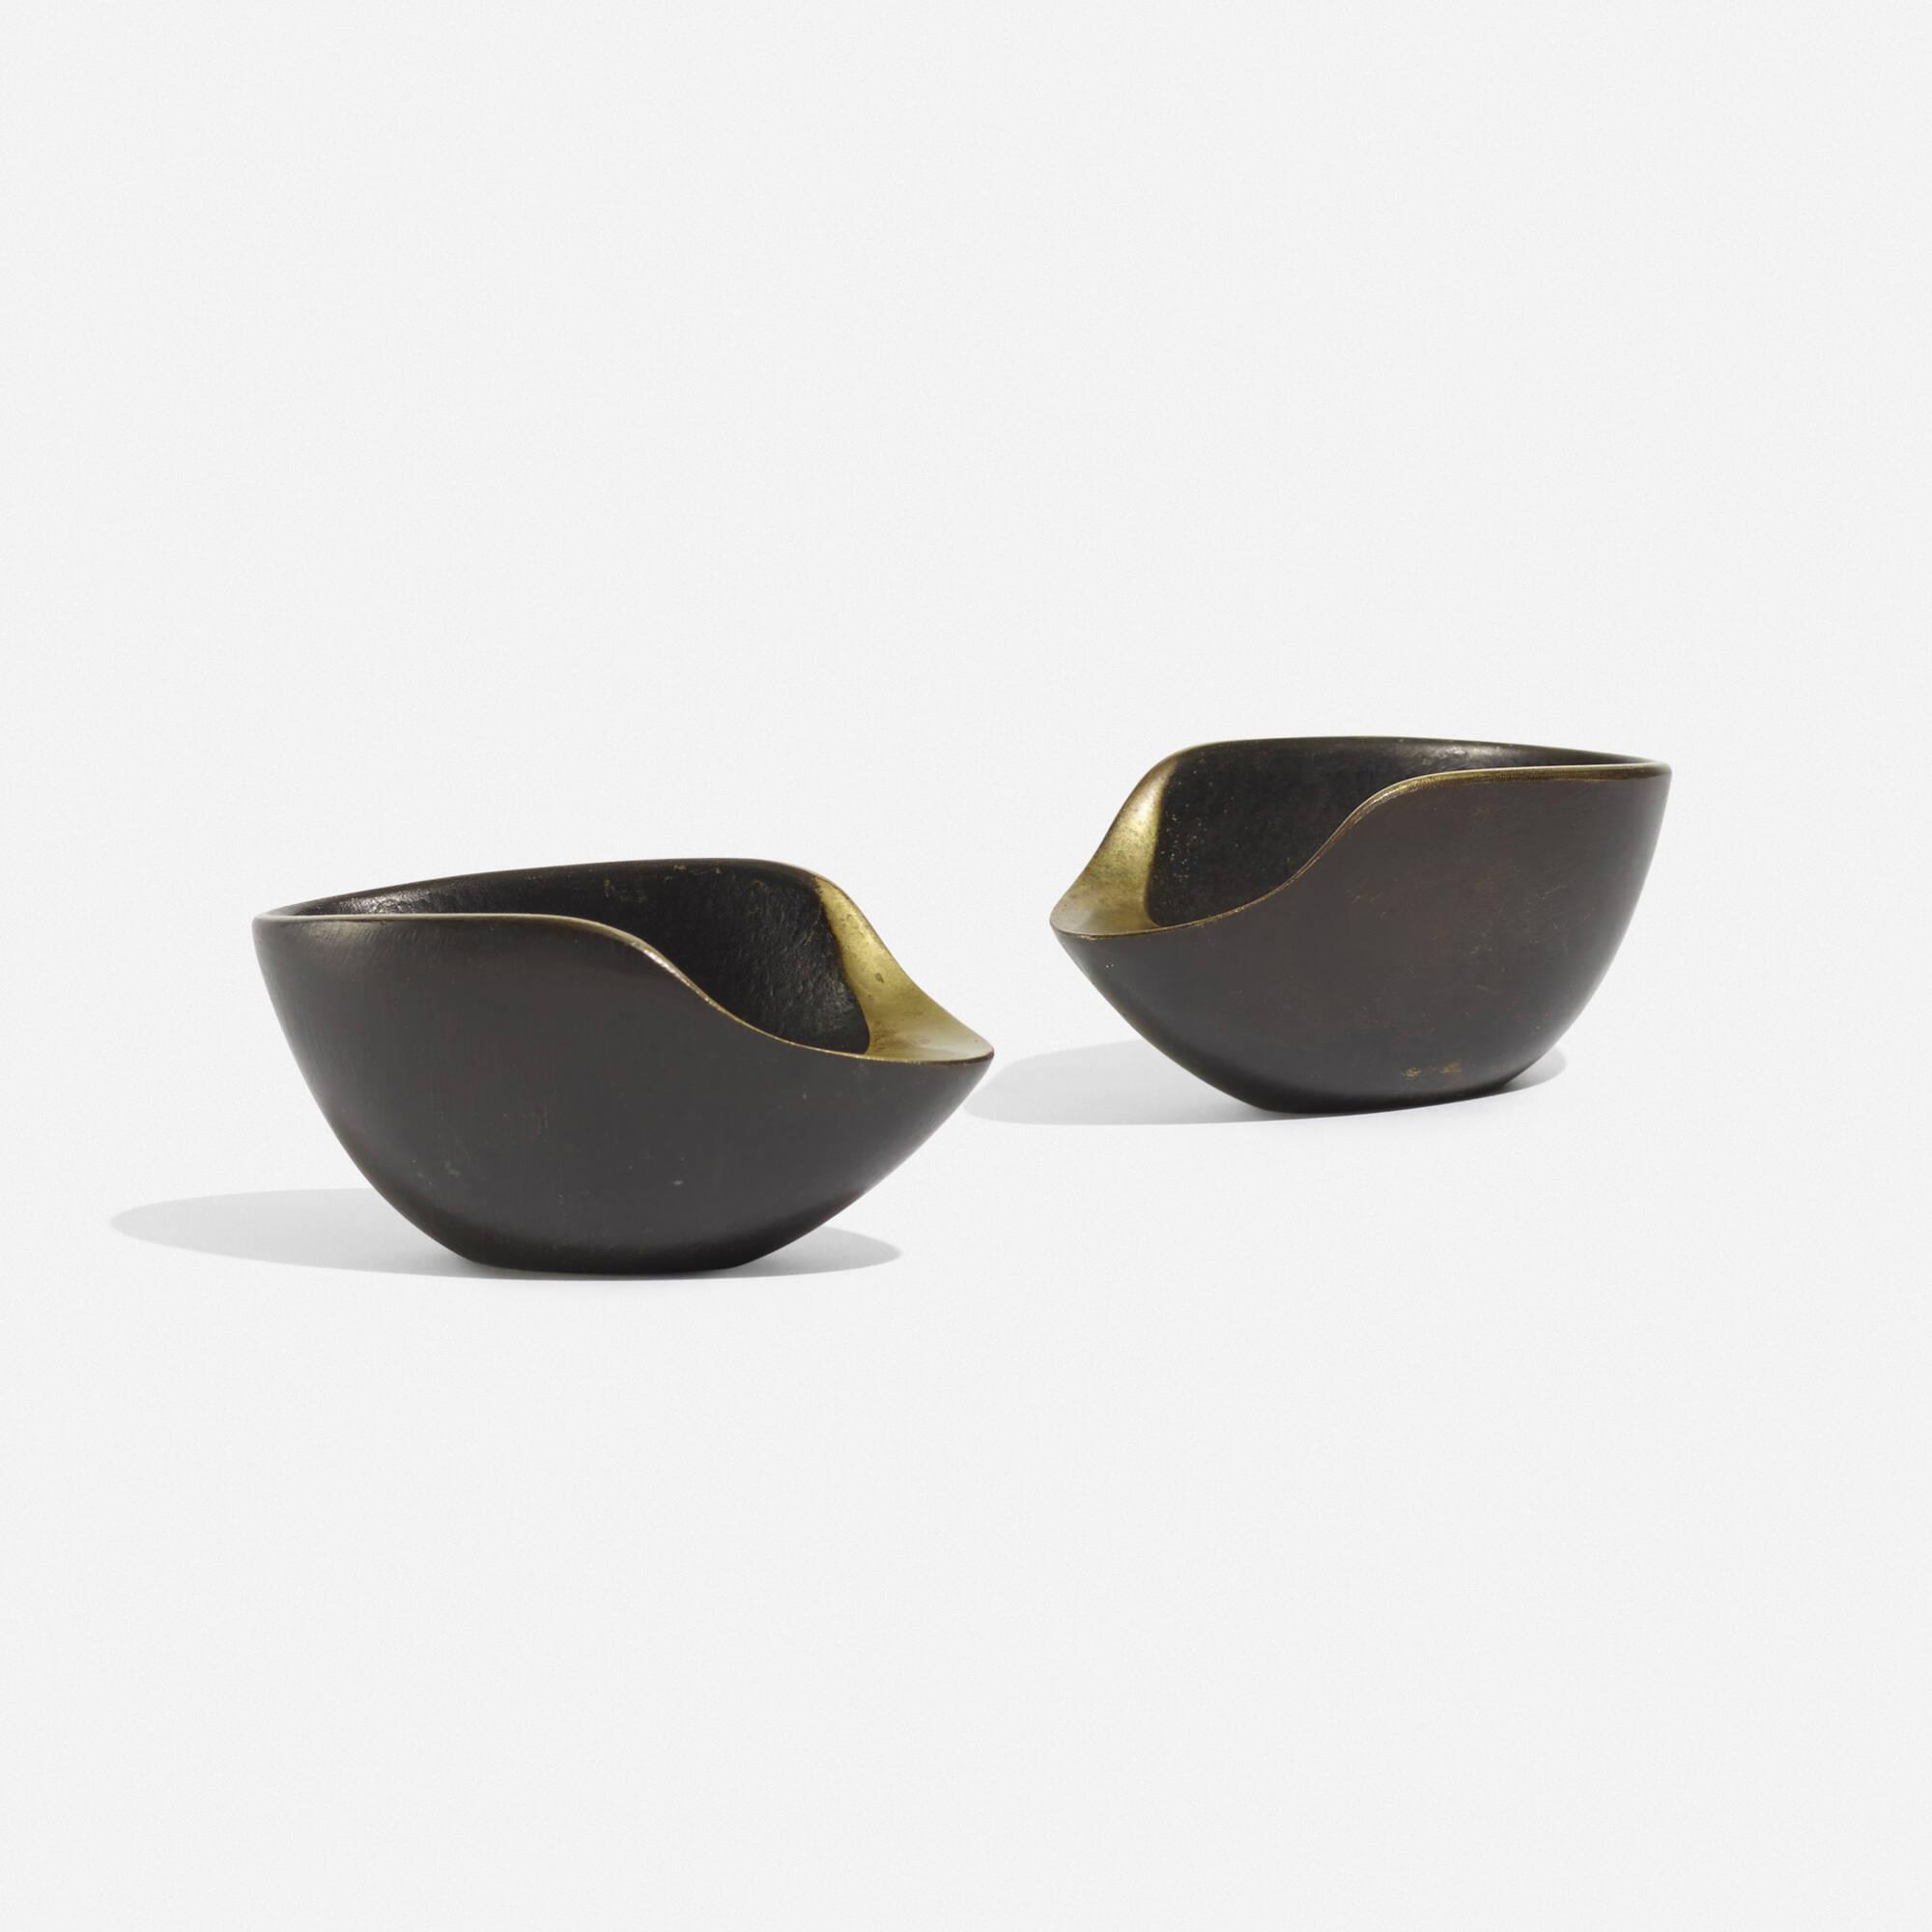 187: Carl Auböck II / ashtrays model 3597, pair (2 of 3)